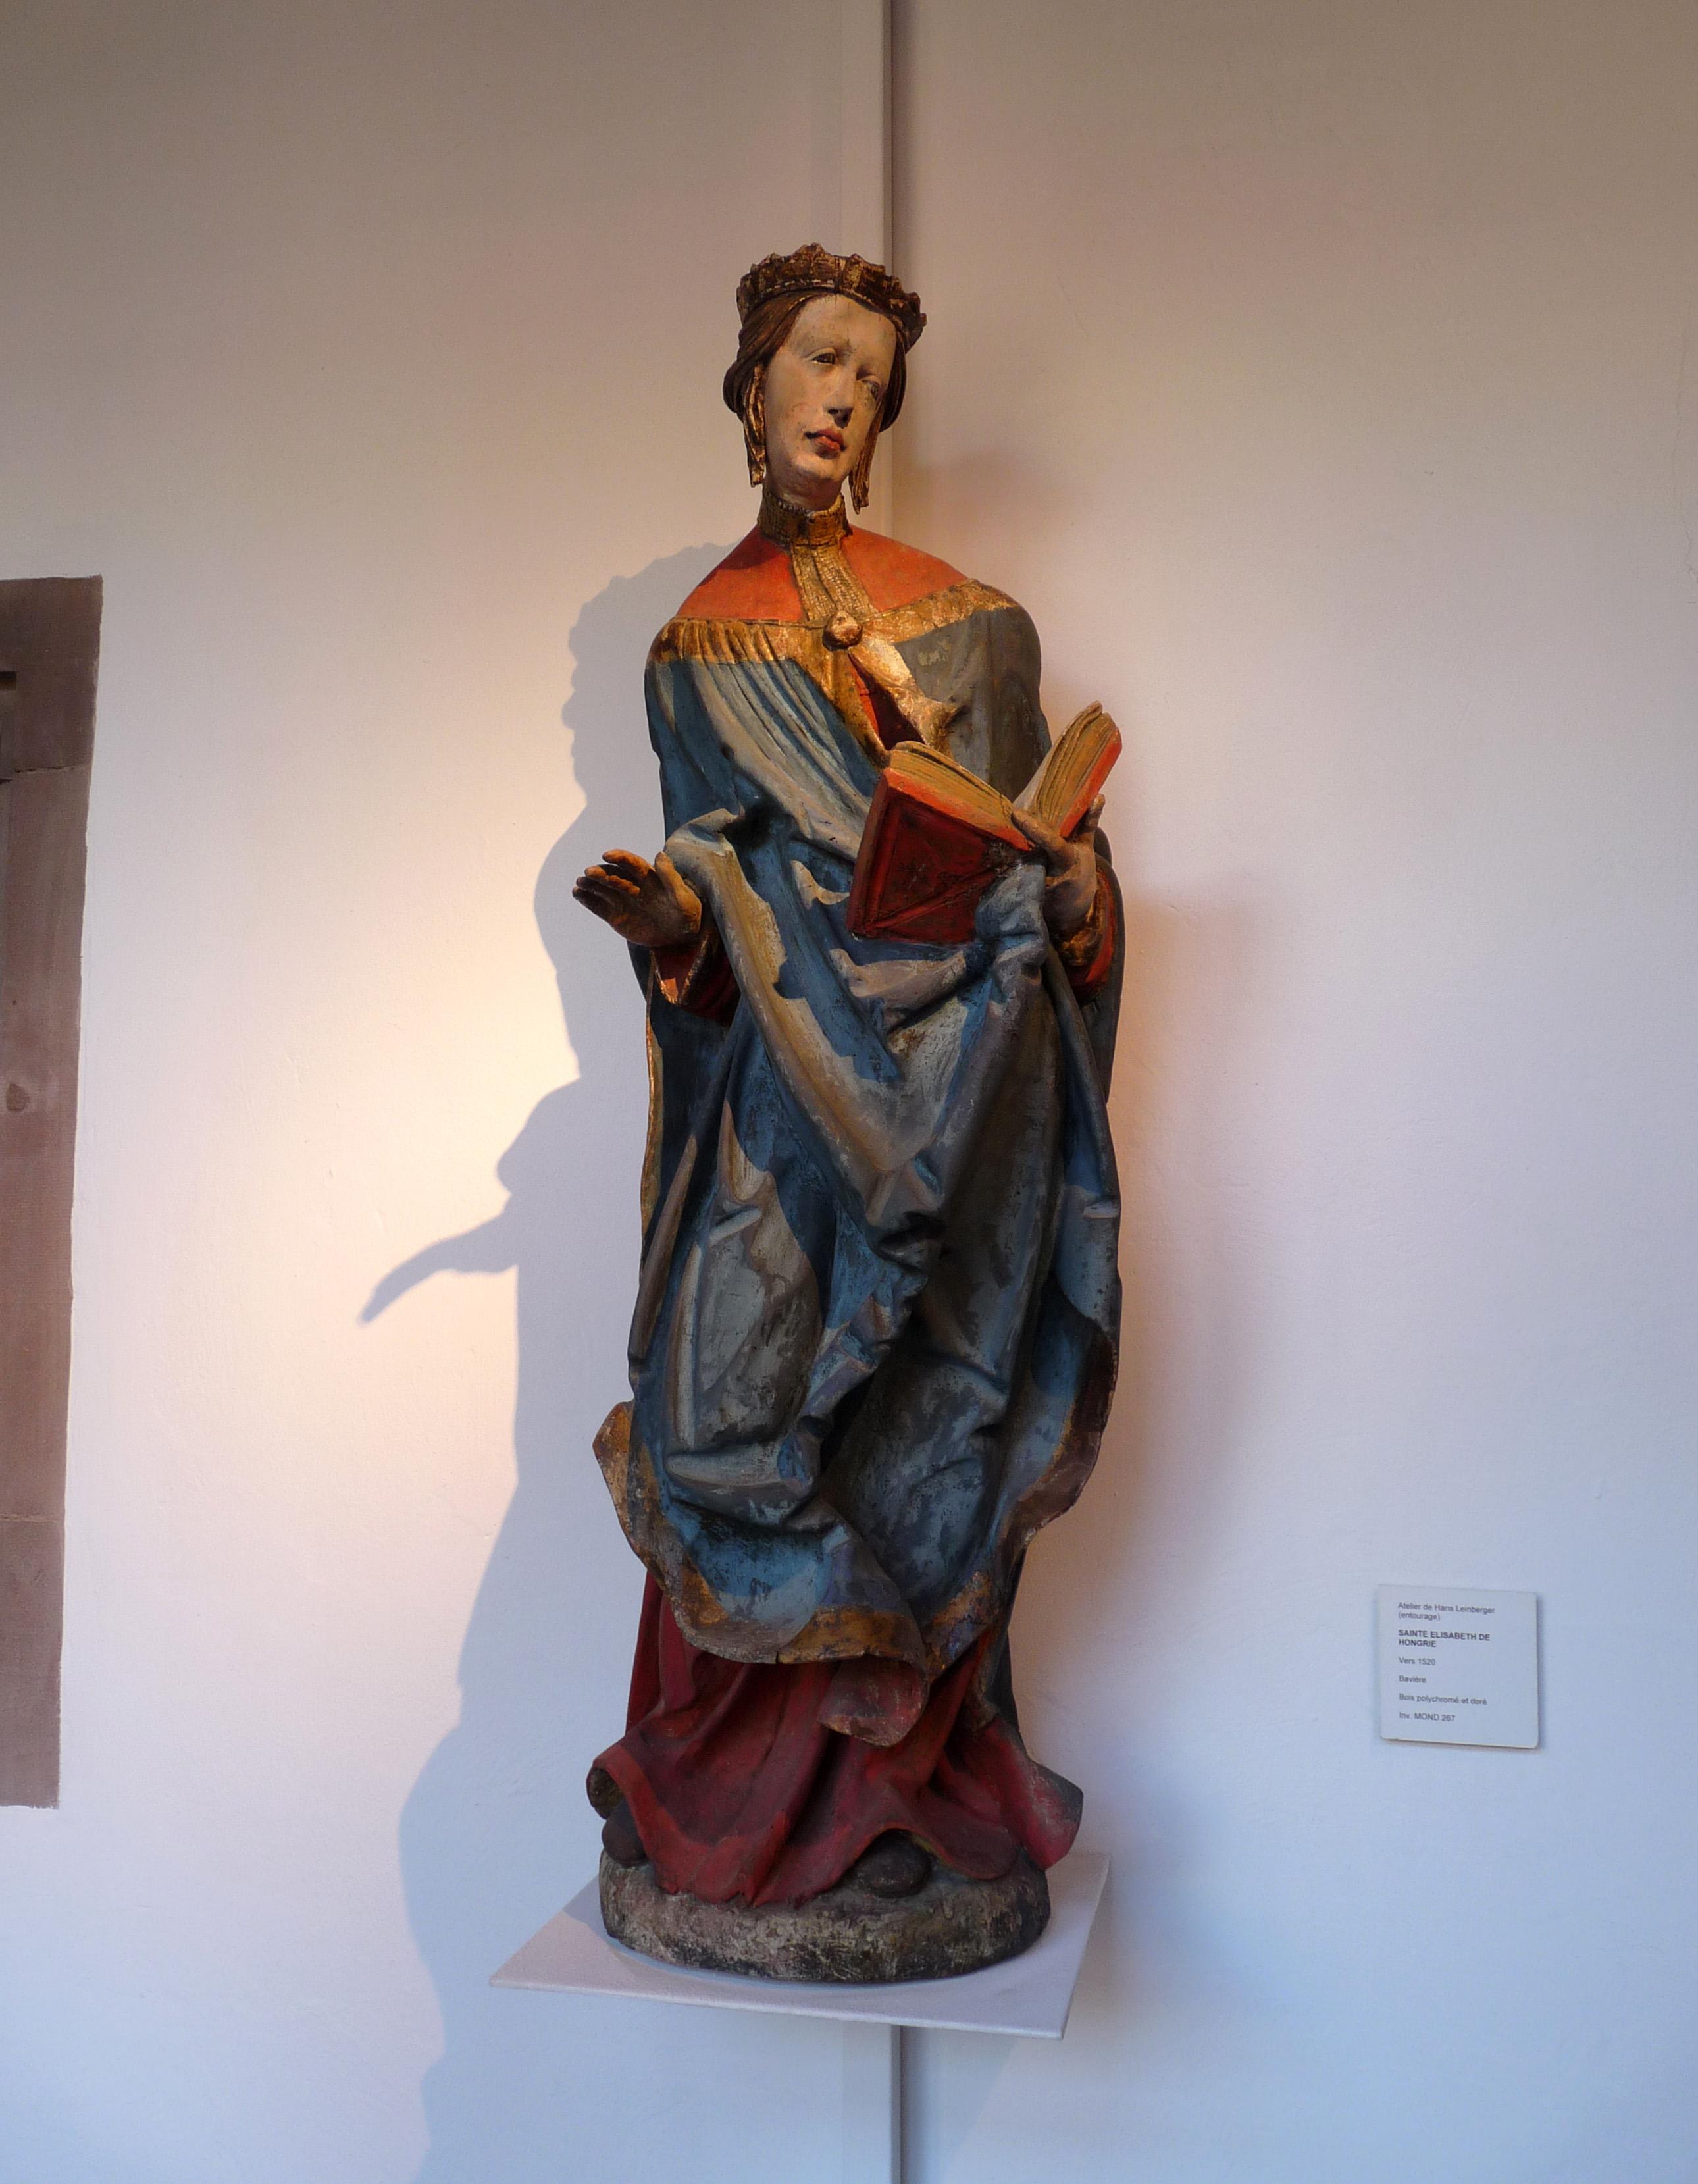 https://upload.wikimedia.org/wikipedia/commons/8/80/Sainte_Elisabeth_de_Hongrie-Mus%C3%A9e_de_l%27Oeuvre_Notre-Dame.jpg